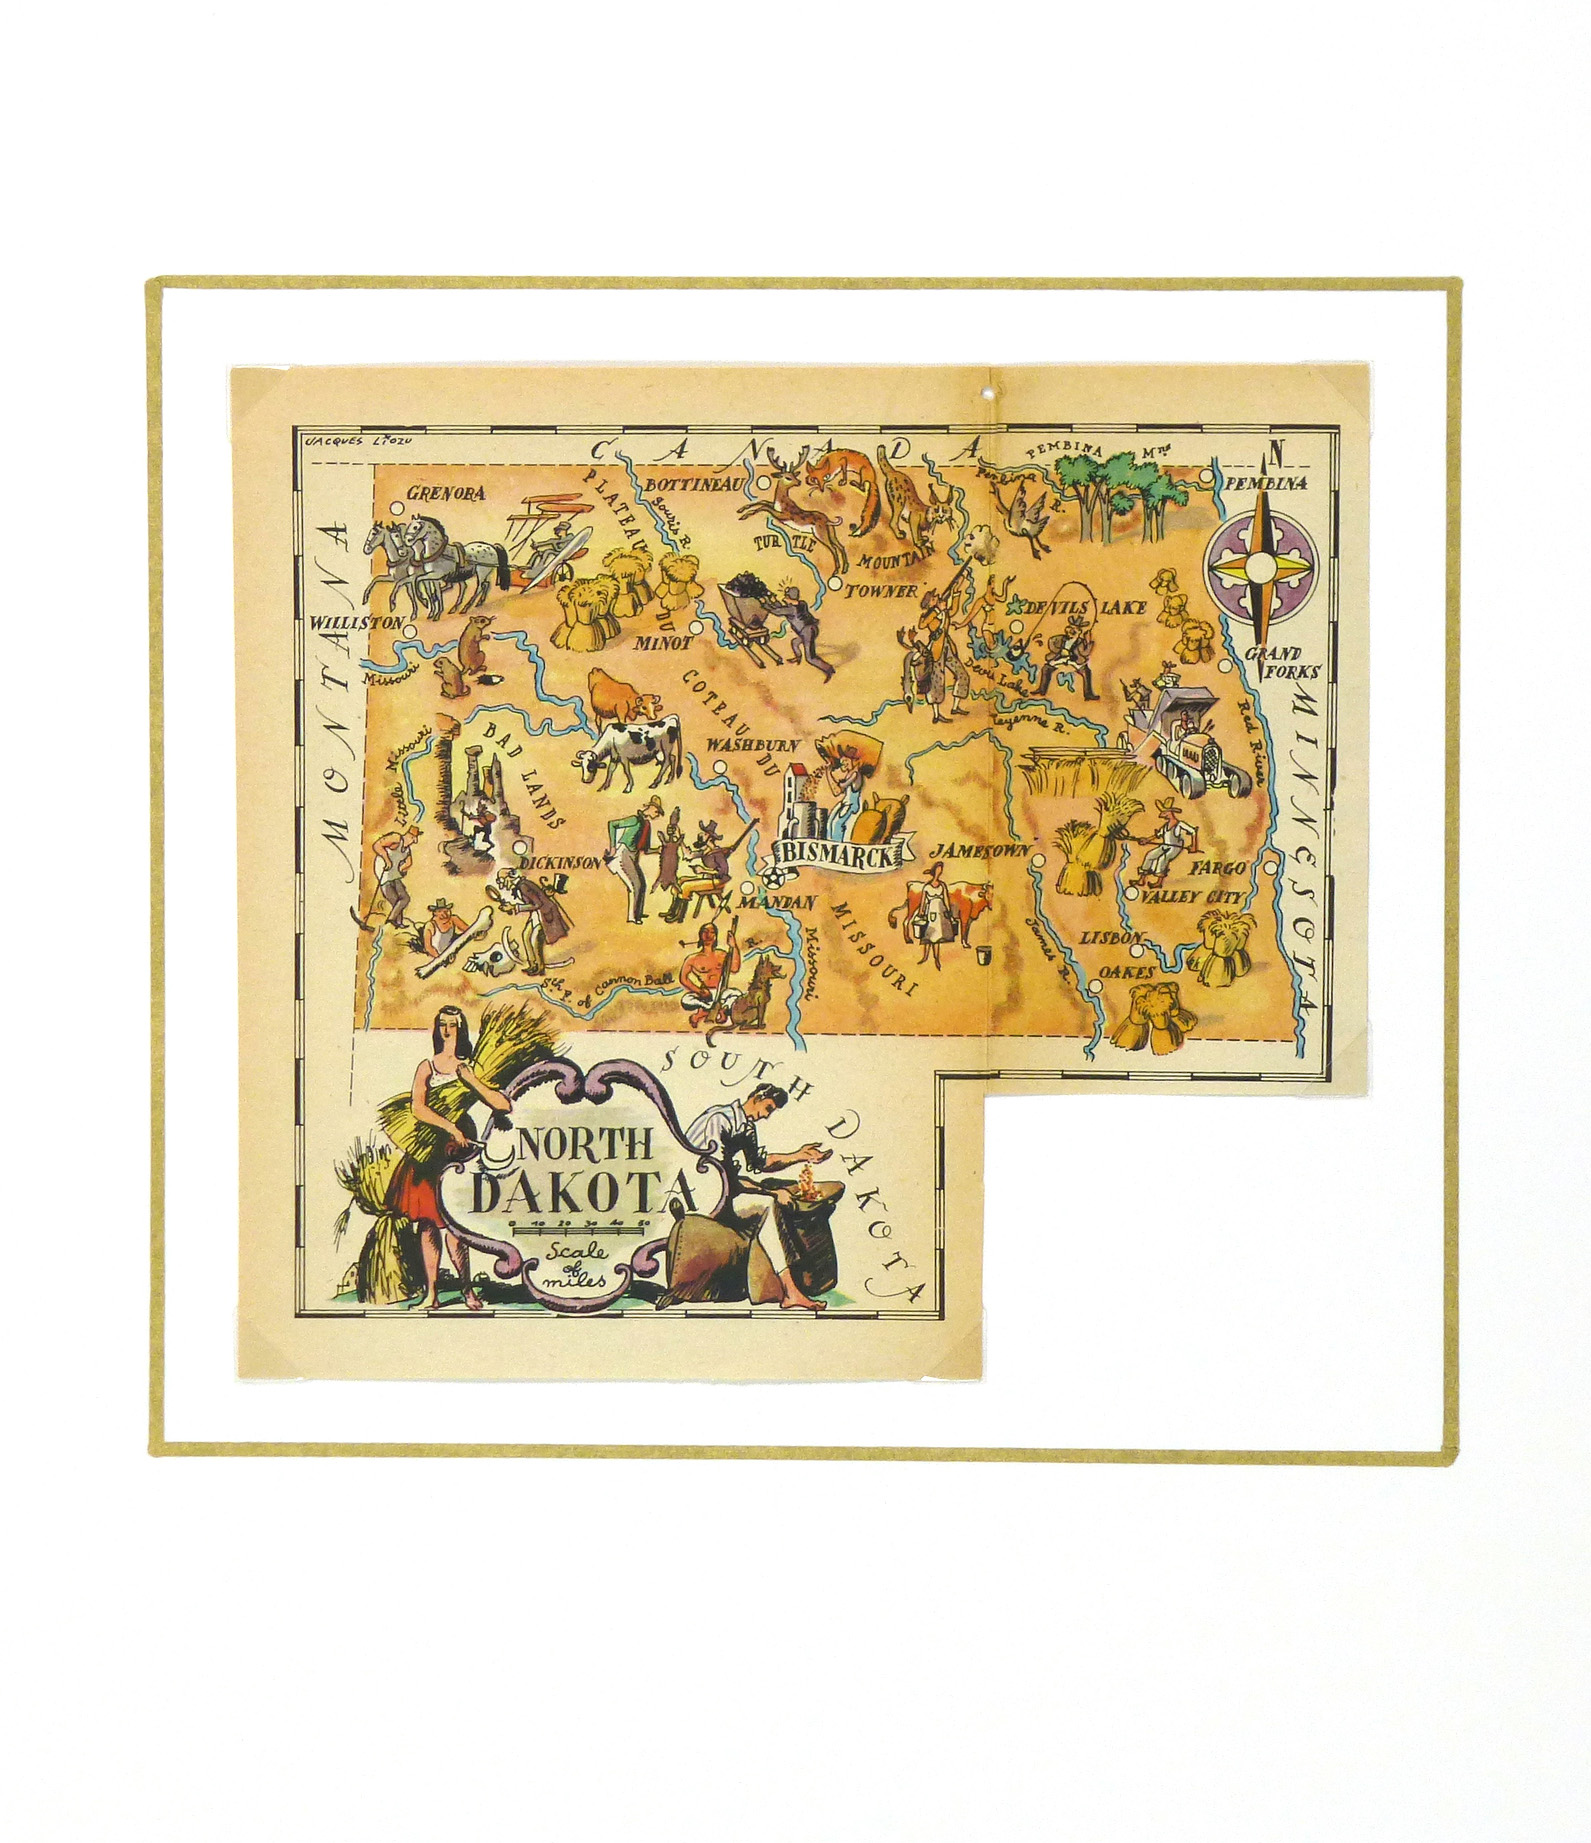 North Dakota Pictorial Map, 1946-matted-6267K